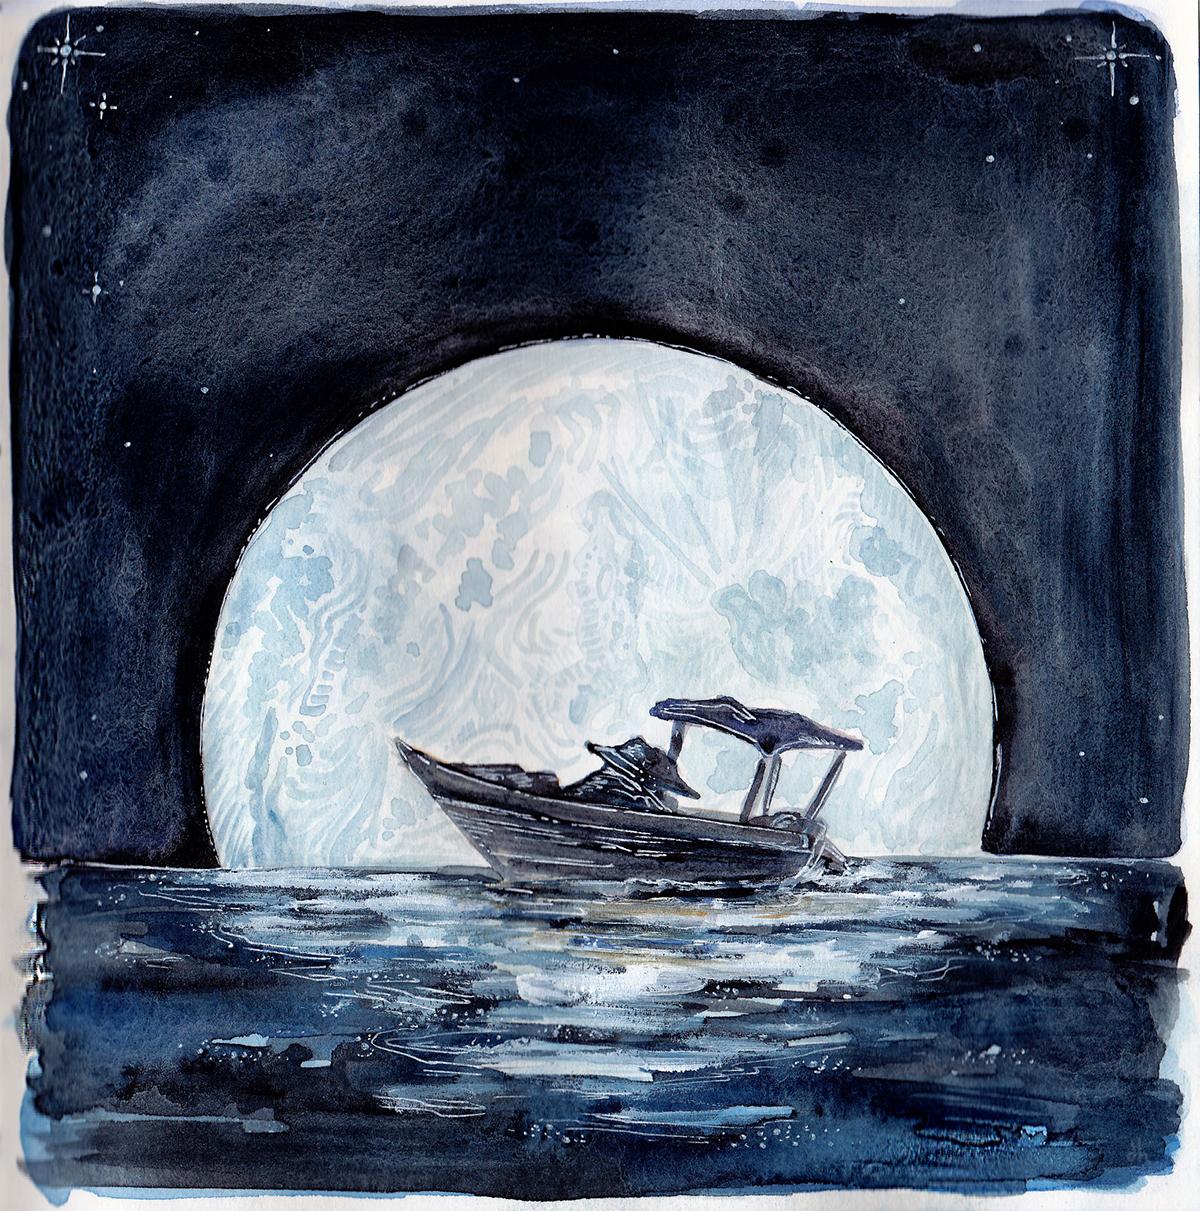 Wanderer iv: The Night